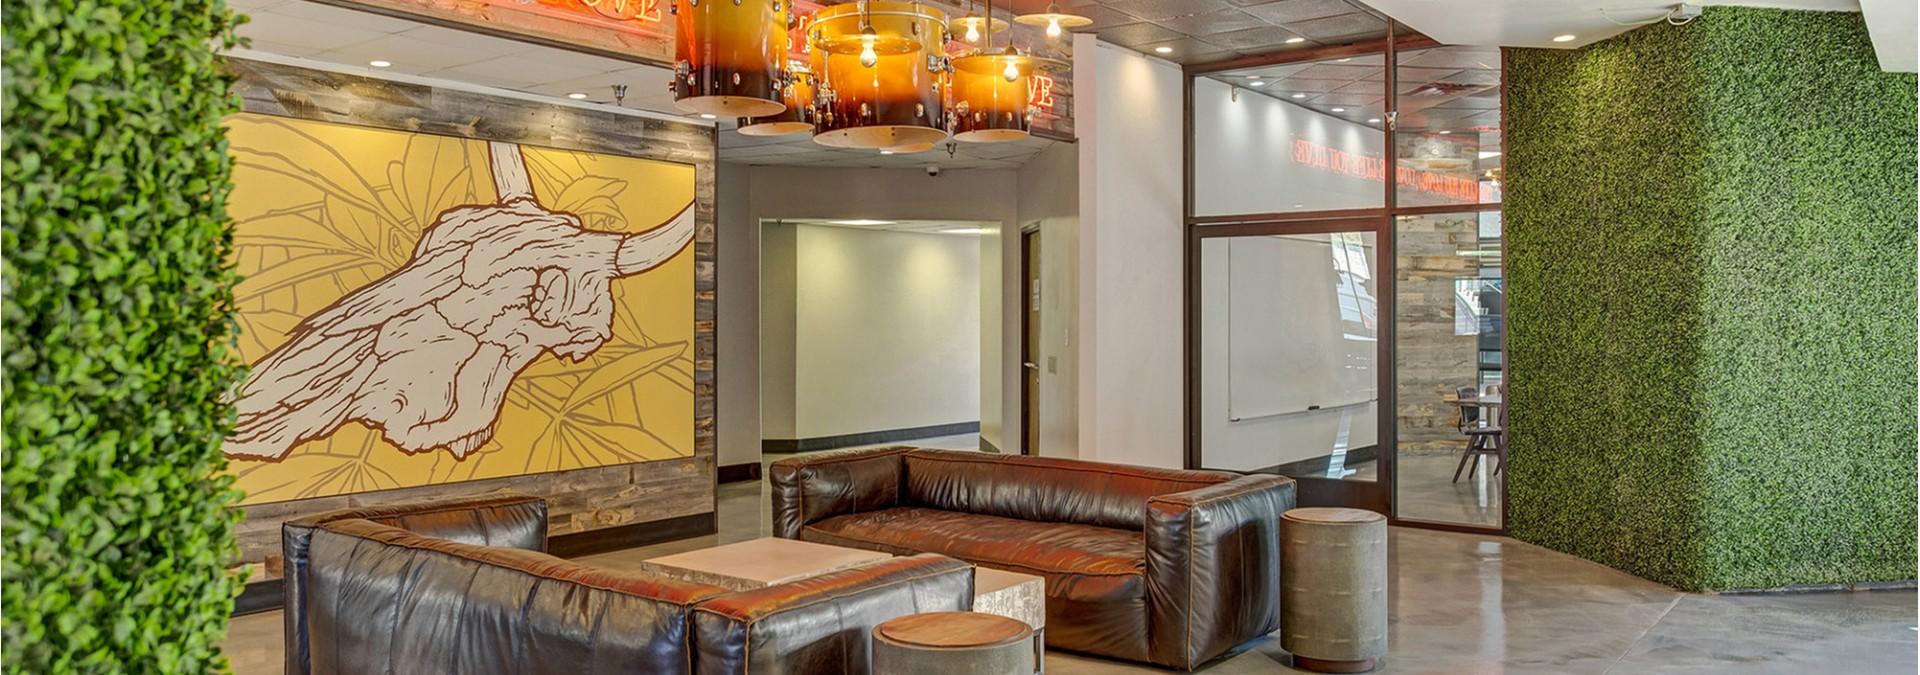 Dobie Twenty21 Student Spaces Clubhouse 2